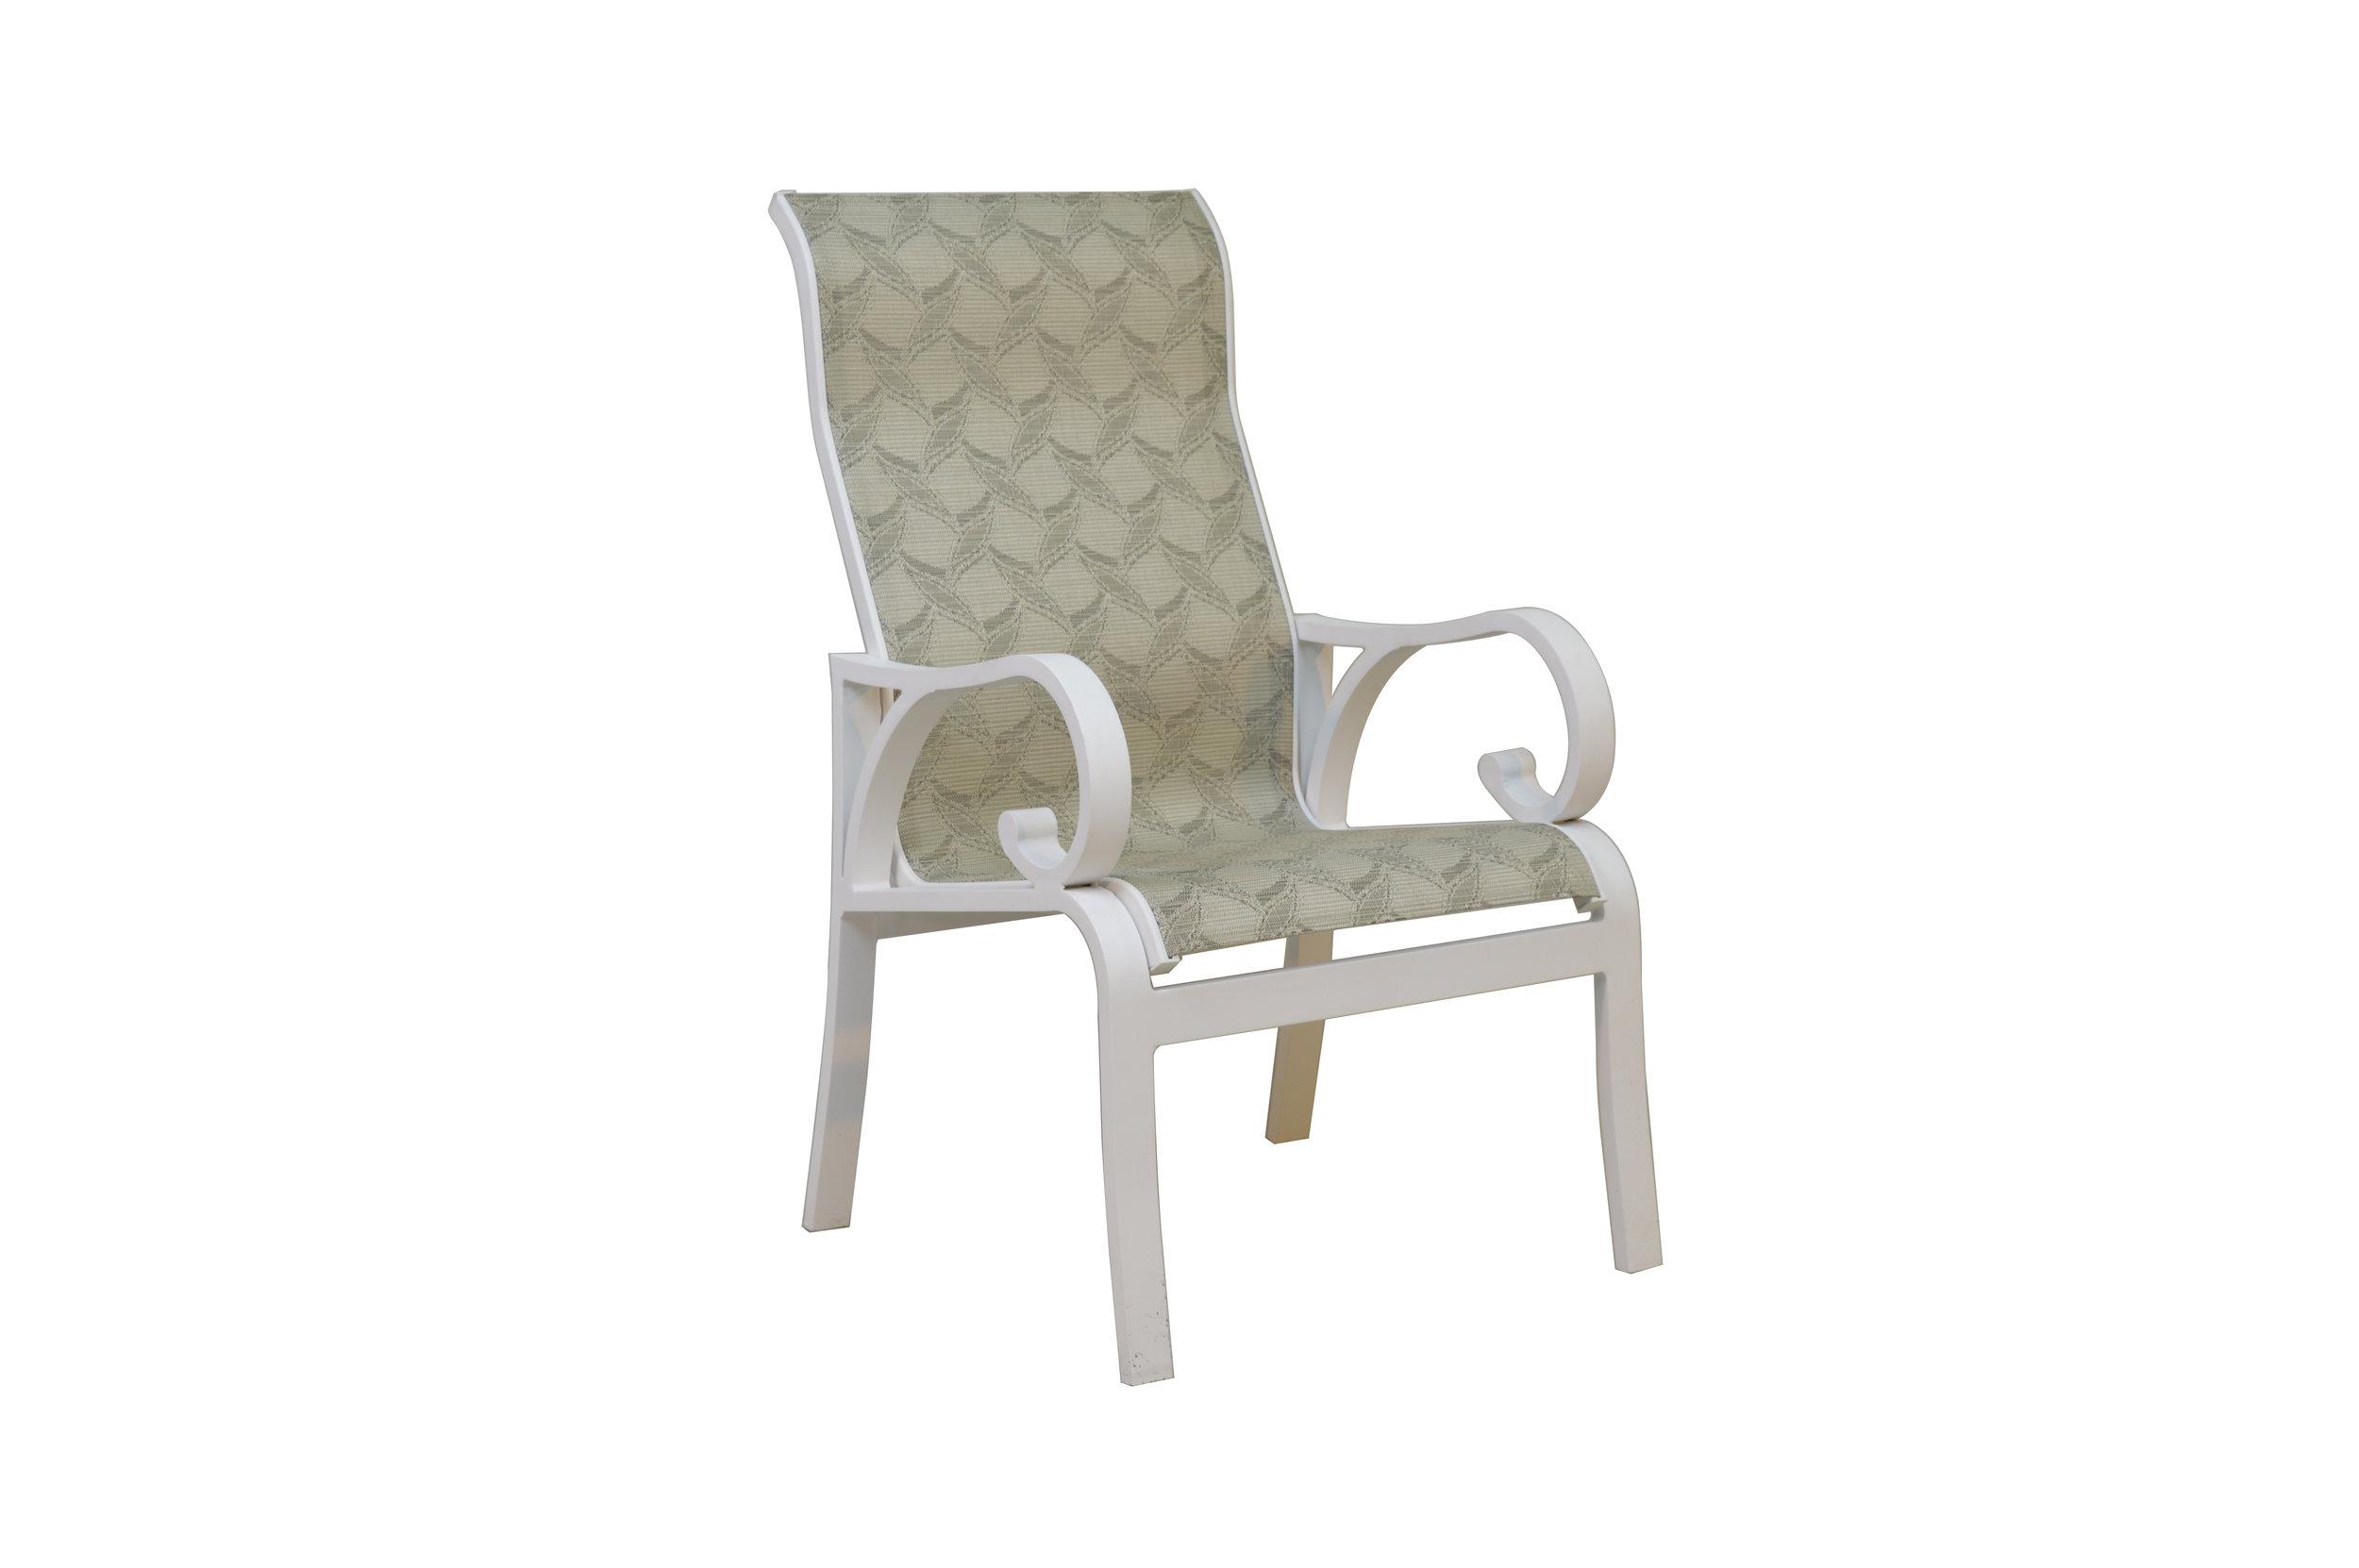 601521 Key Largo Dining Chair   24.6 x 29.3 x 42.3